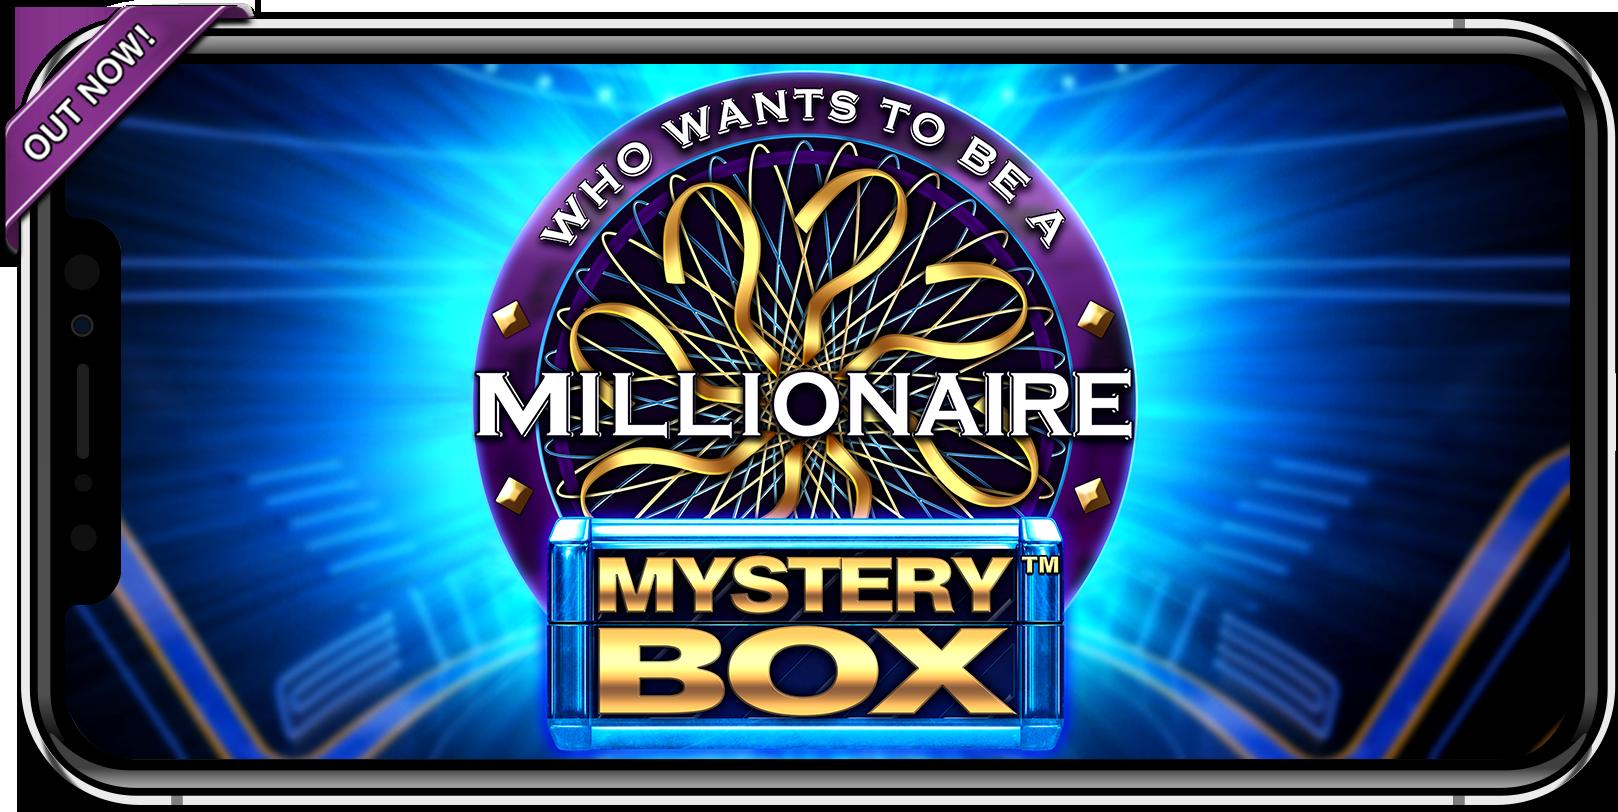 MillionaireMysteryBox_iPhoneX.png